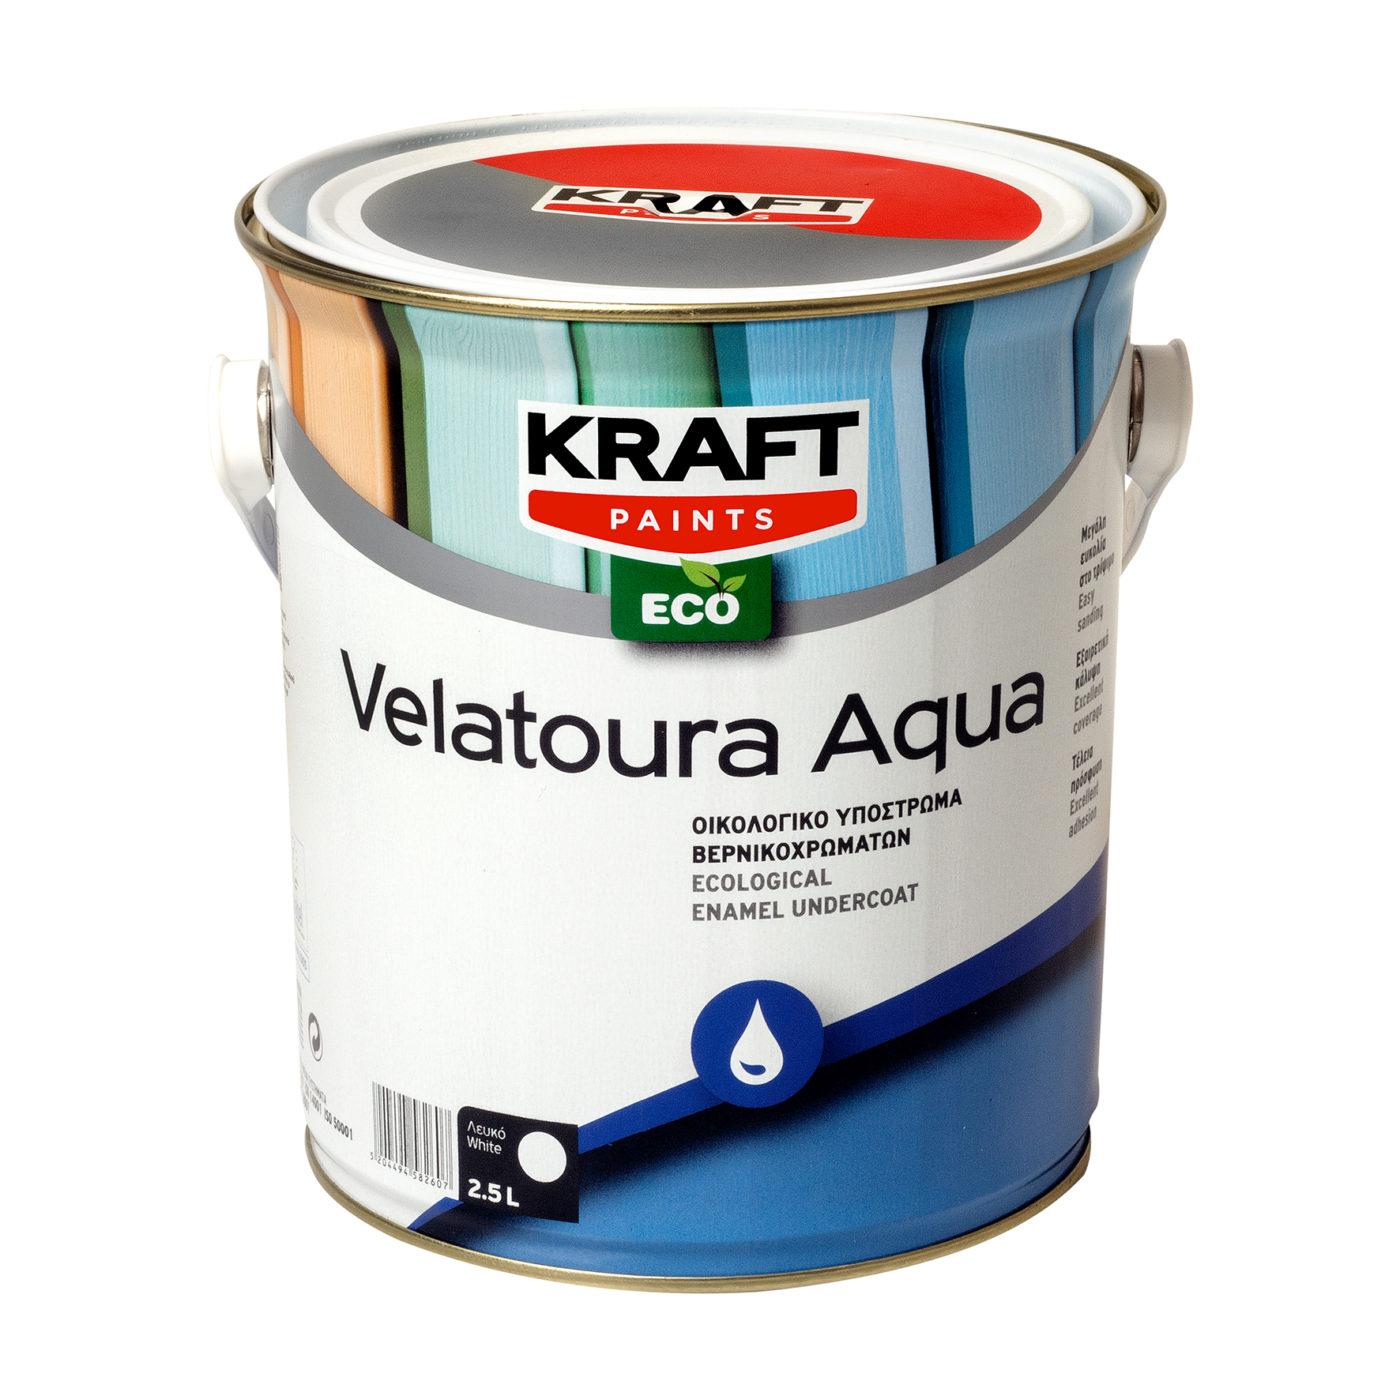 Velatoura Aqua 2,5L